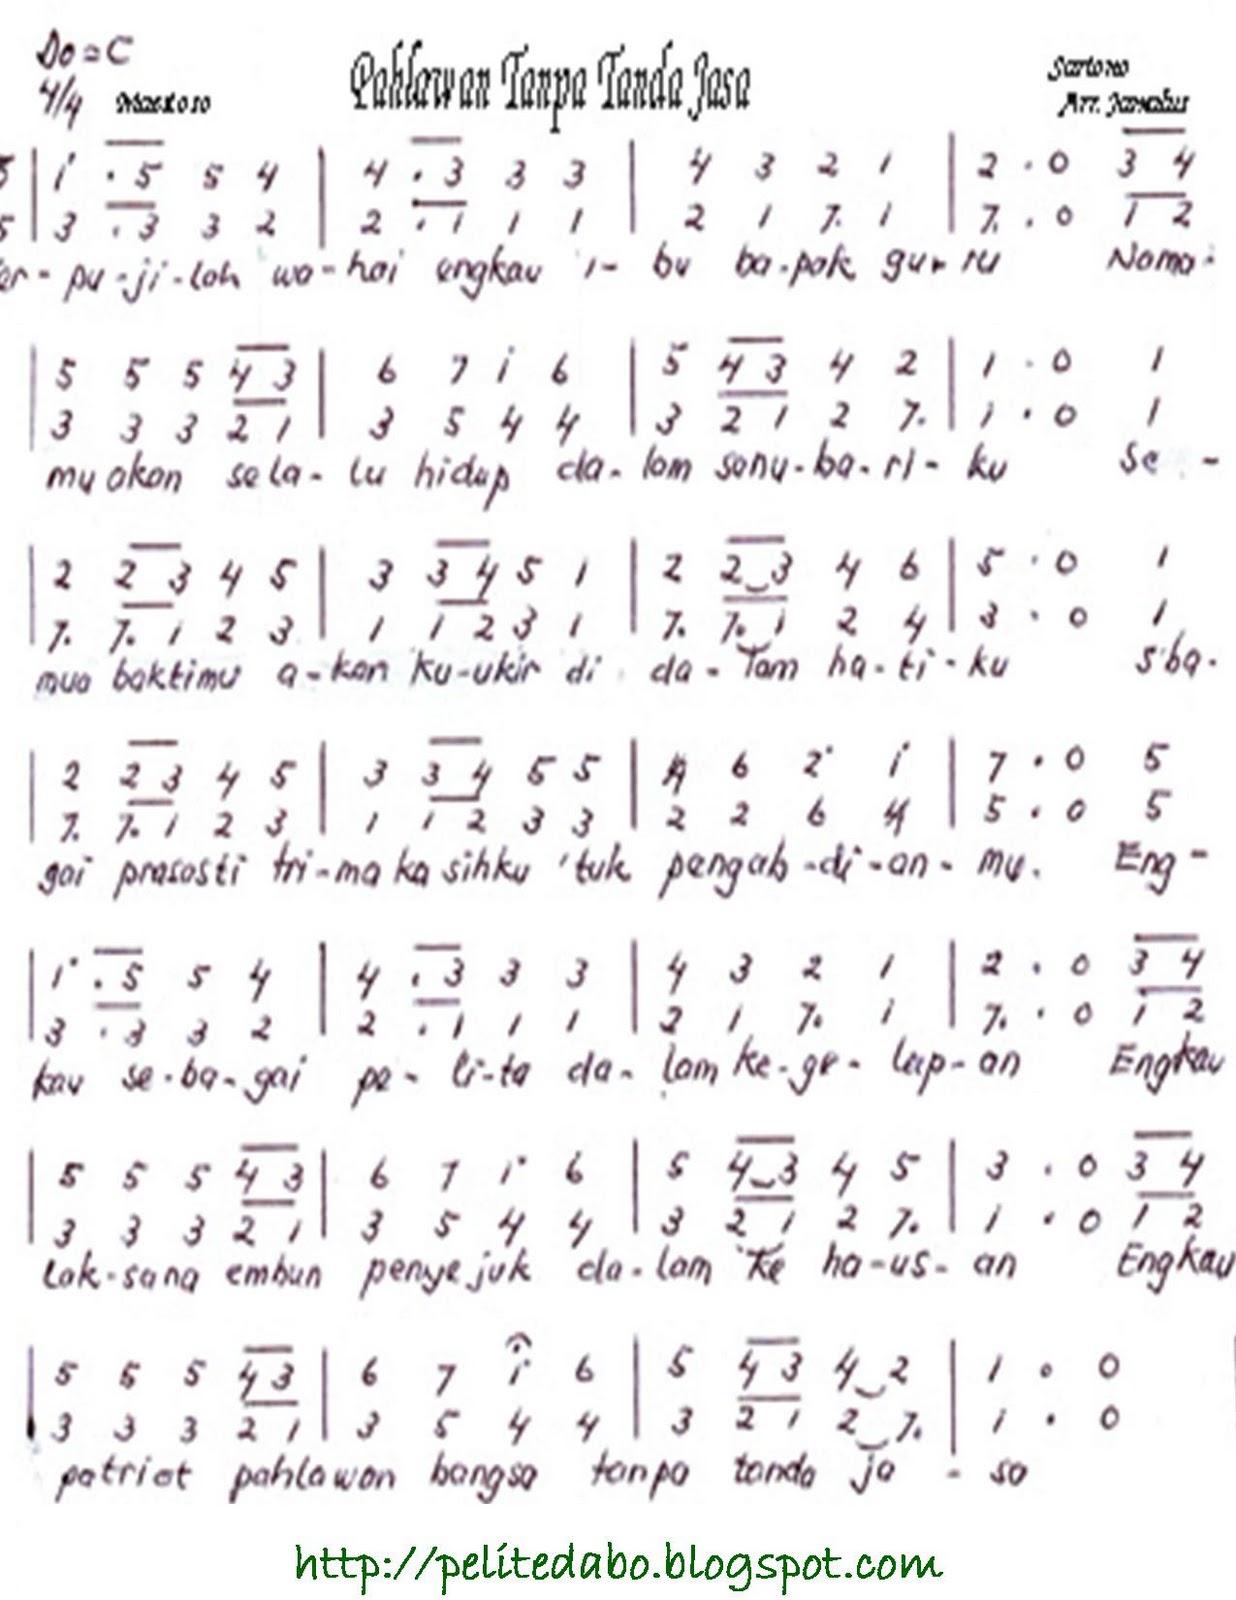 Partitur Lagu Pahlawan Tanpa Tanda Jasa